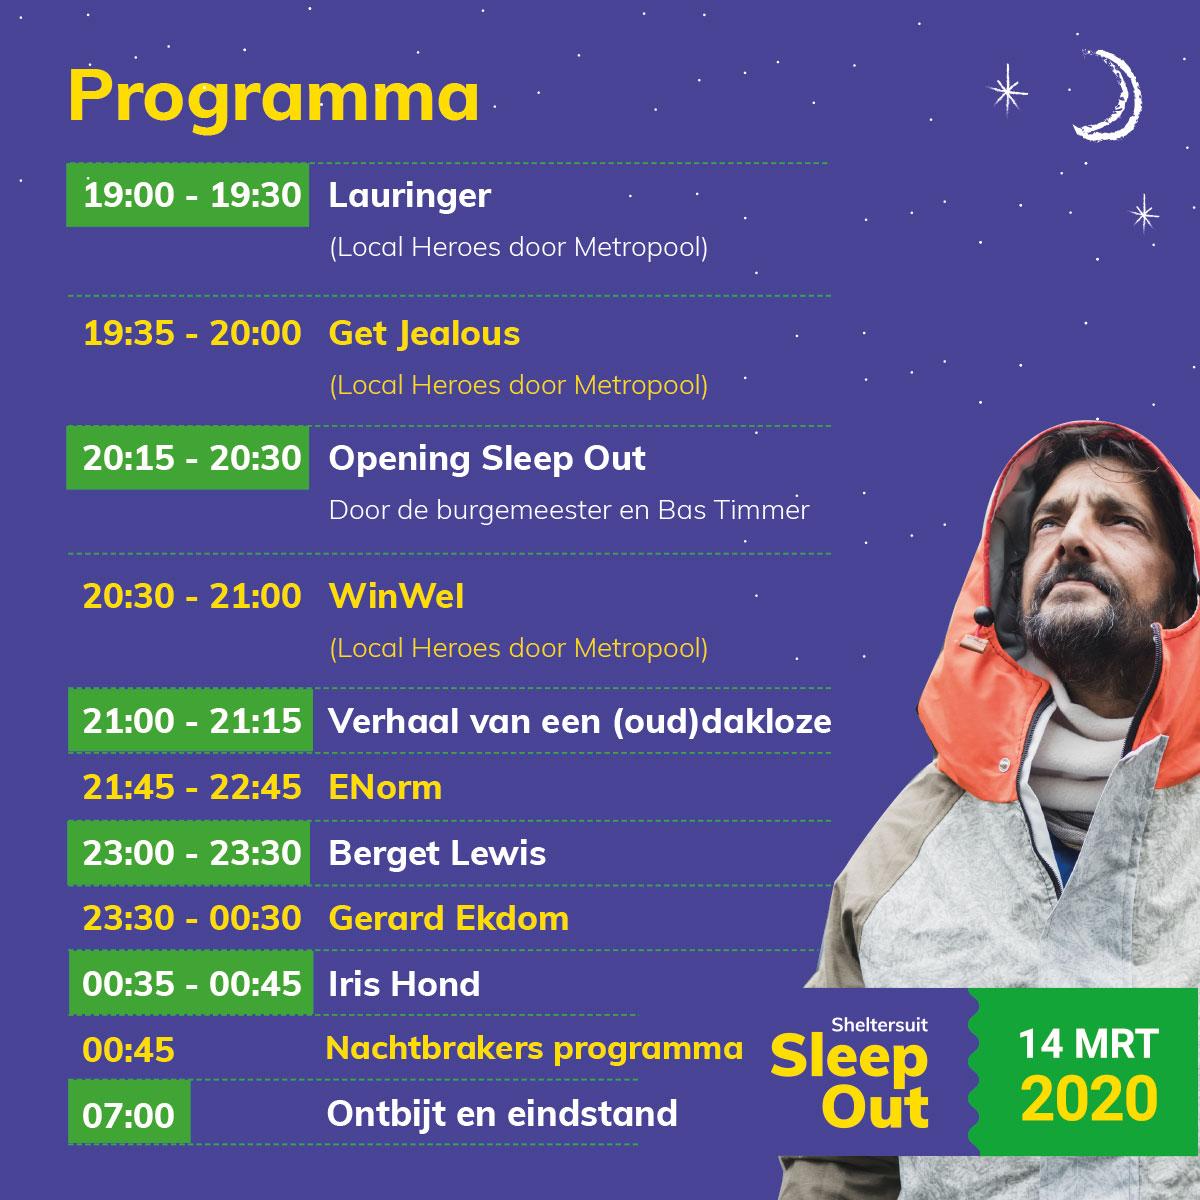 Programma Sheltersuit Sleep Out